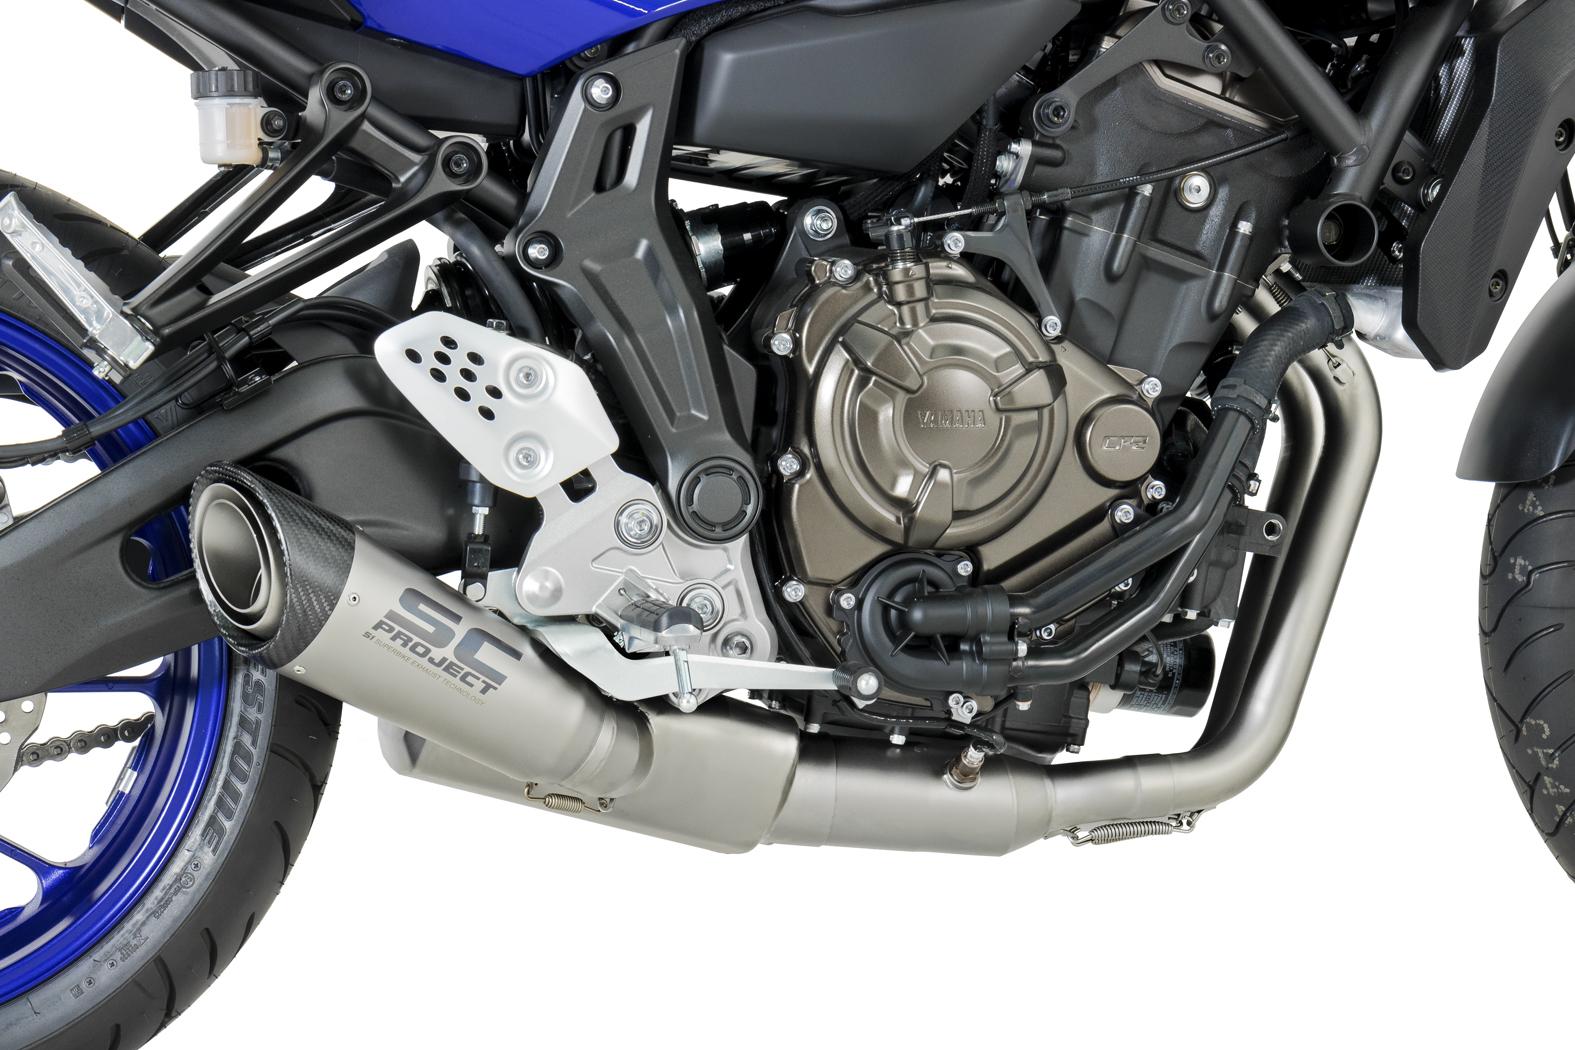 Yamaha MT-07 Completo S1 (1)